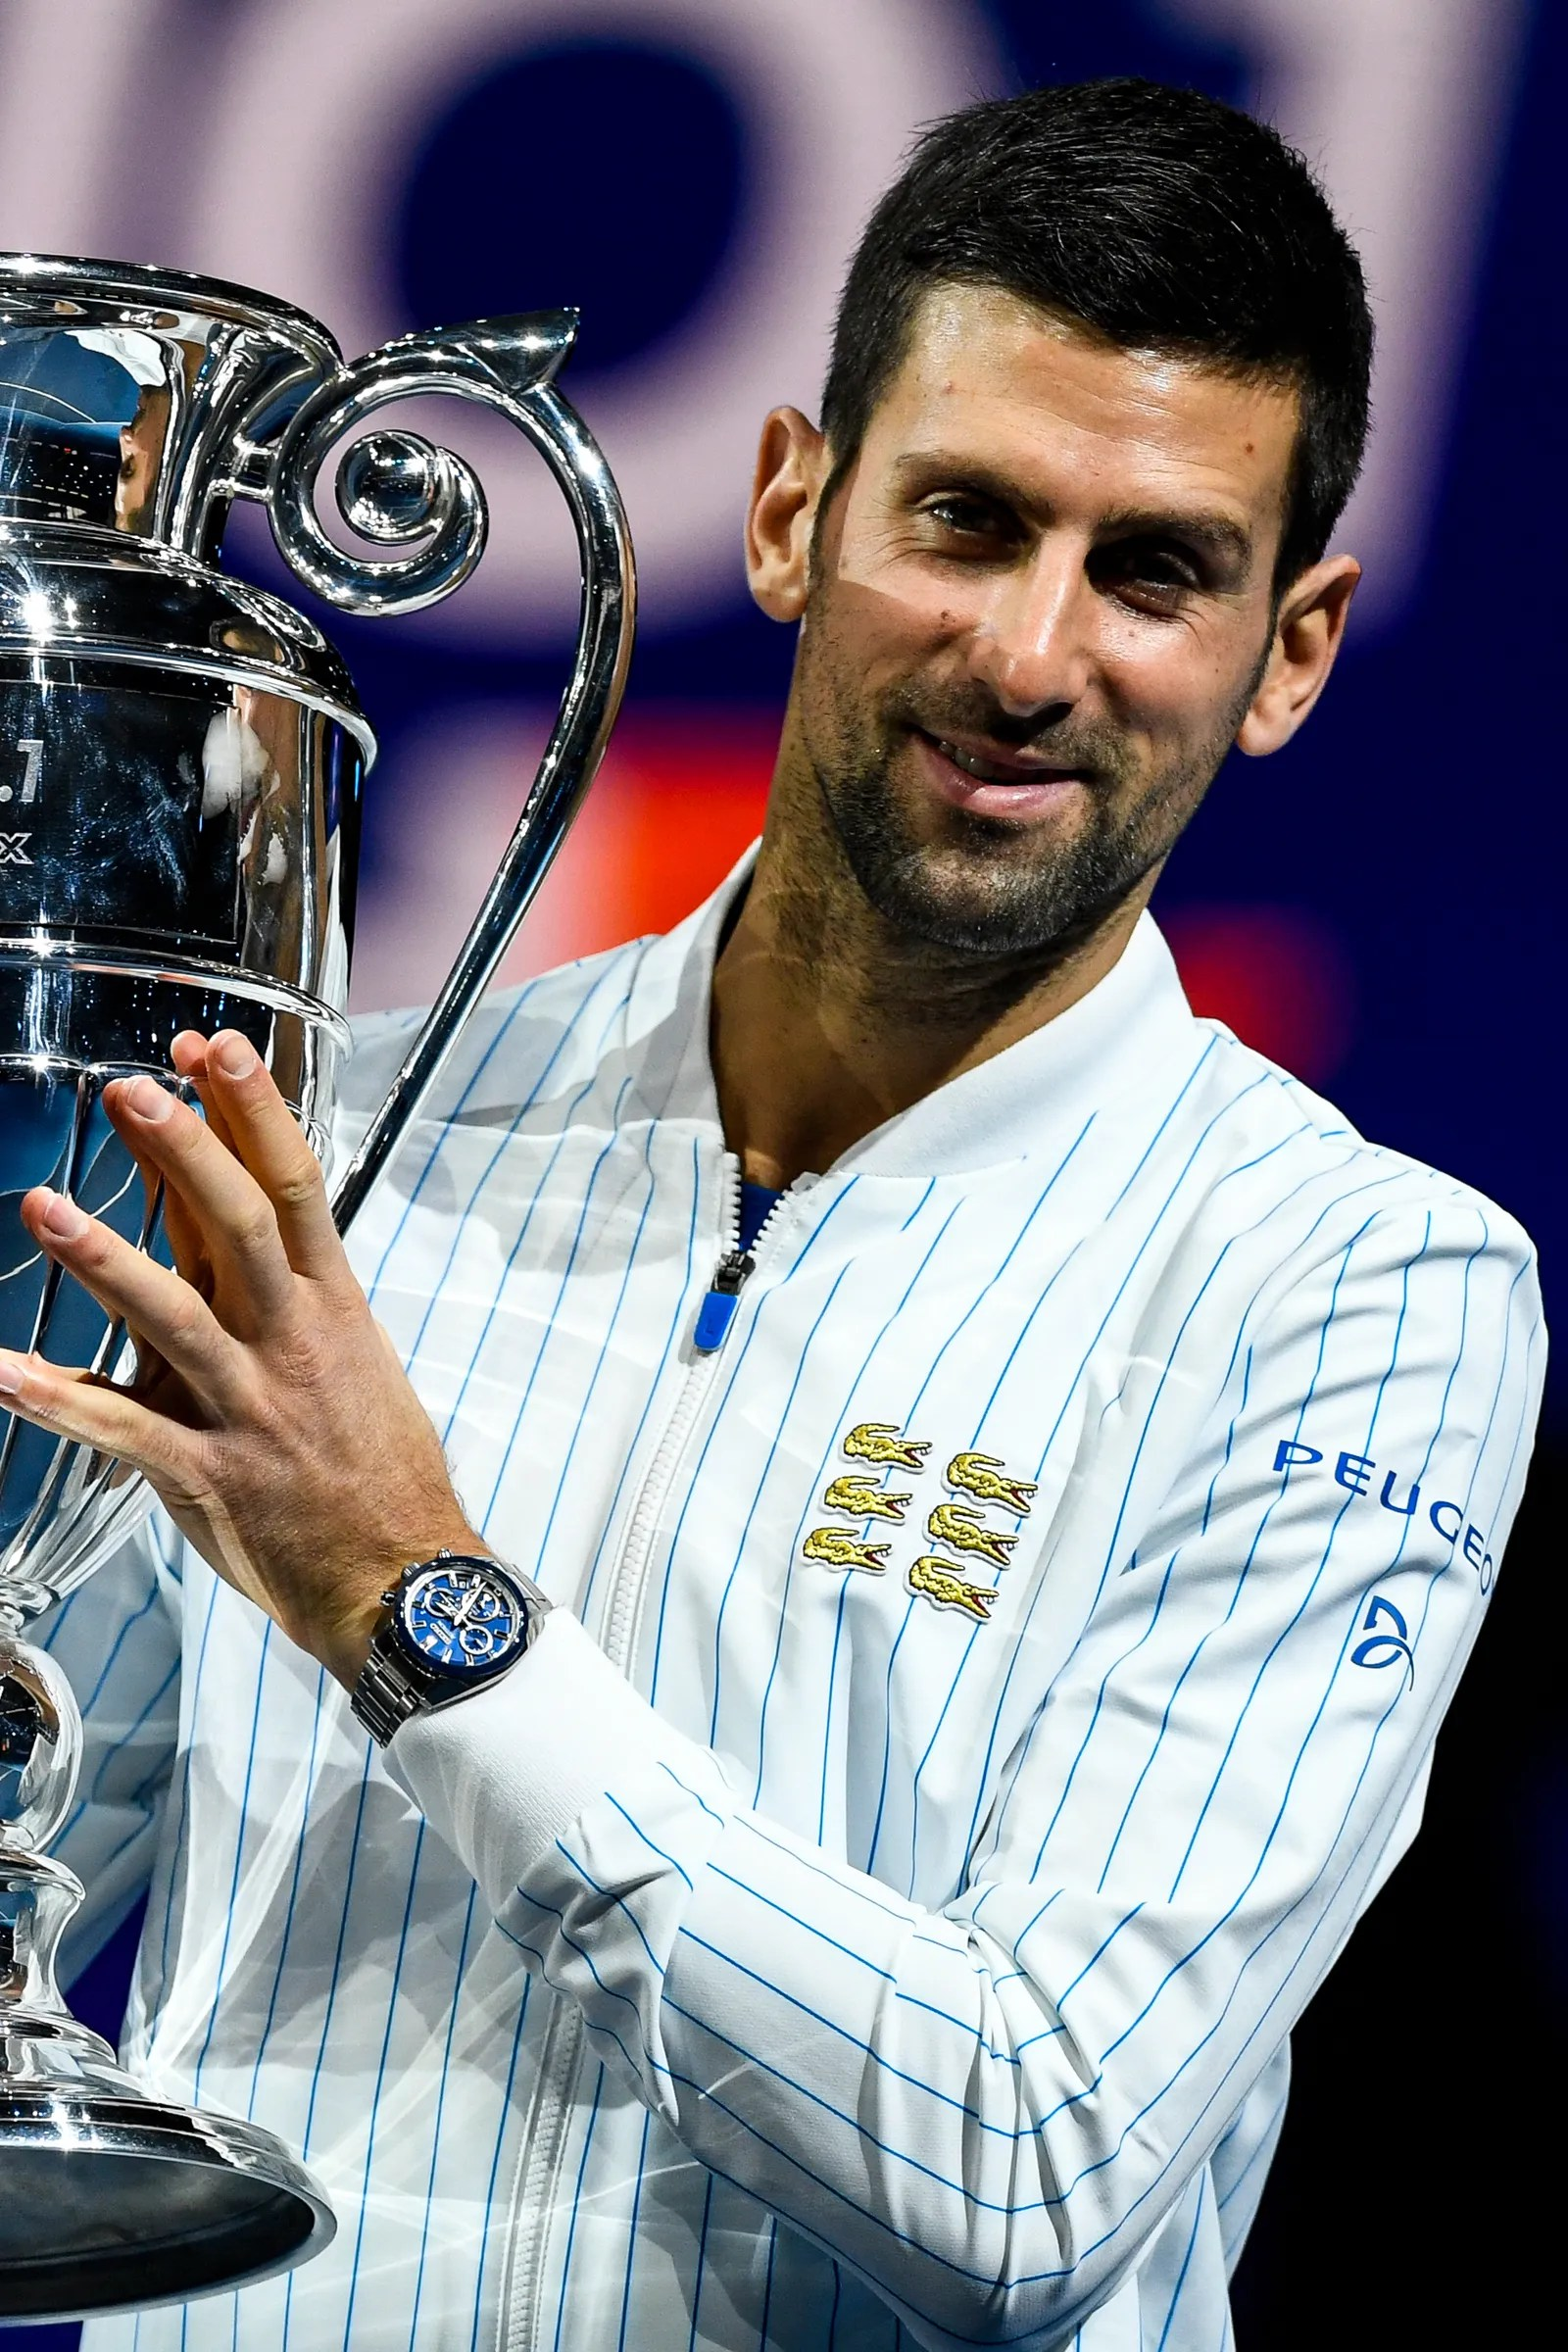 Novak Djokivic smiling and holding a big trophy